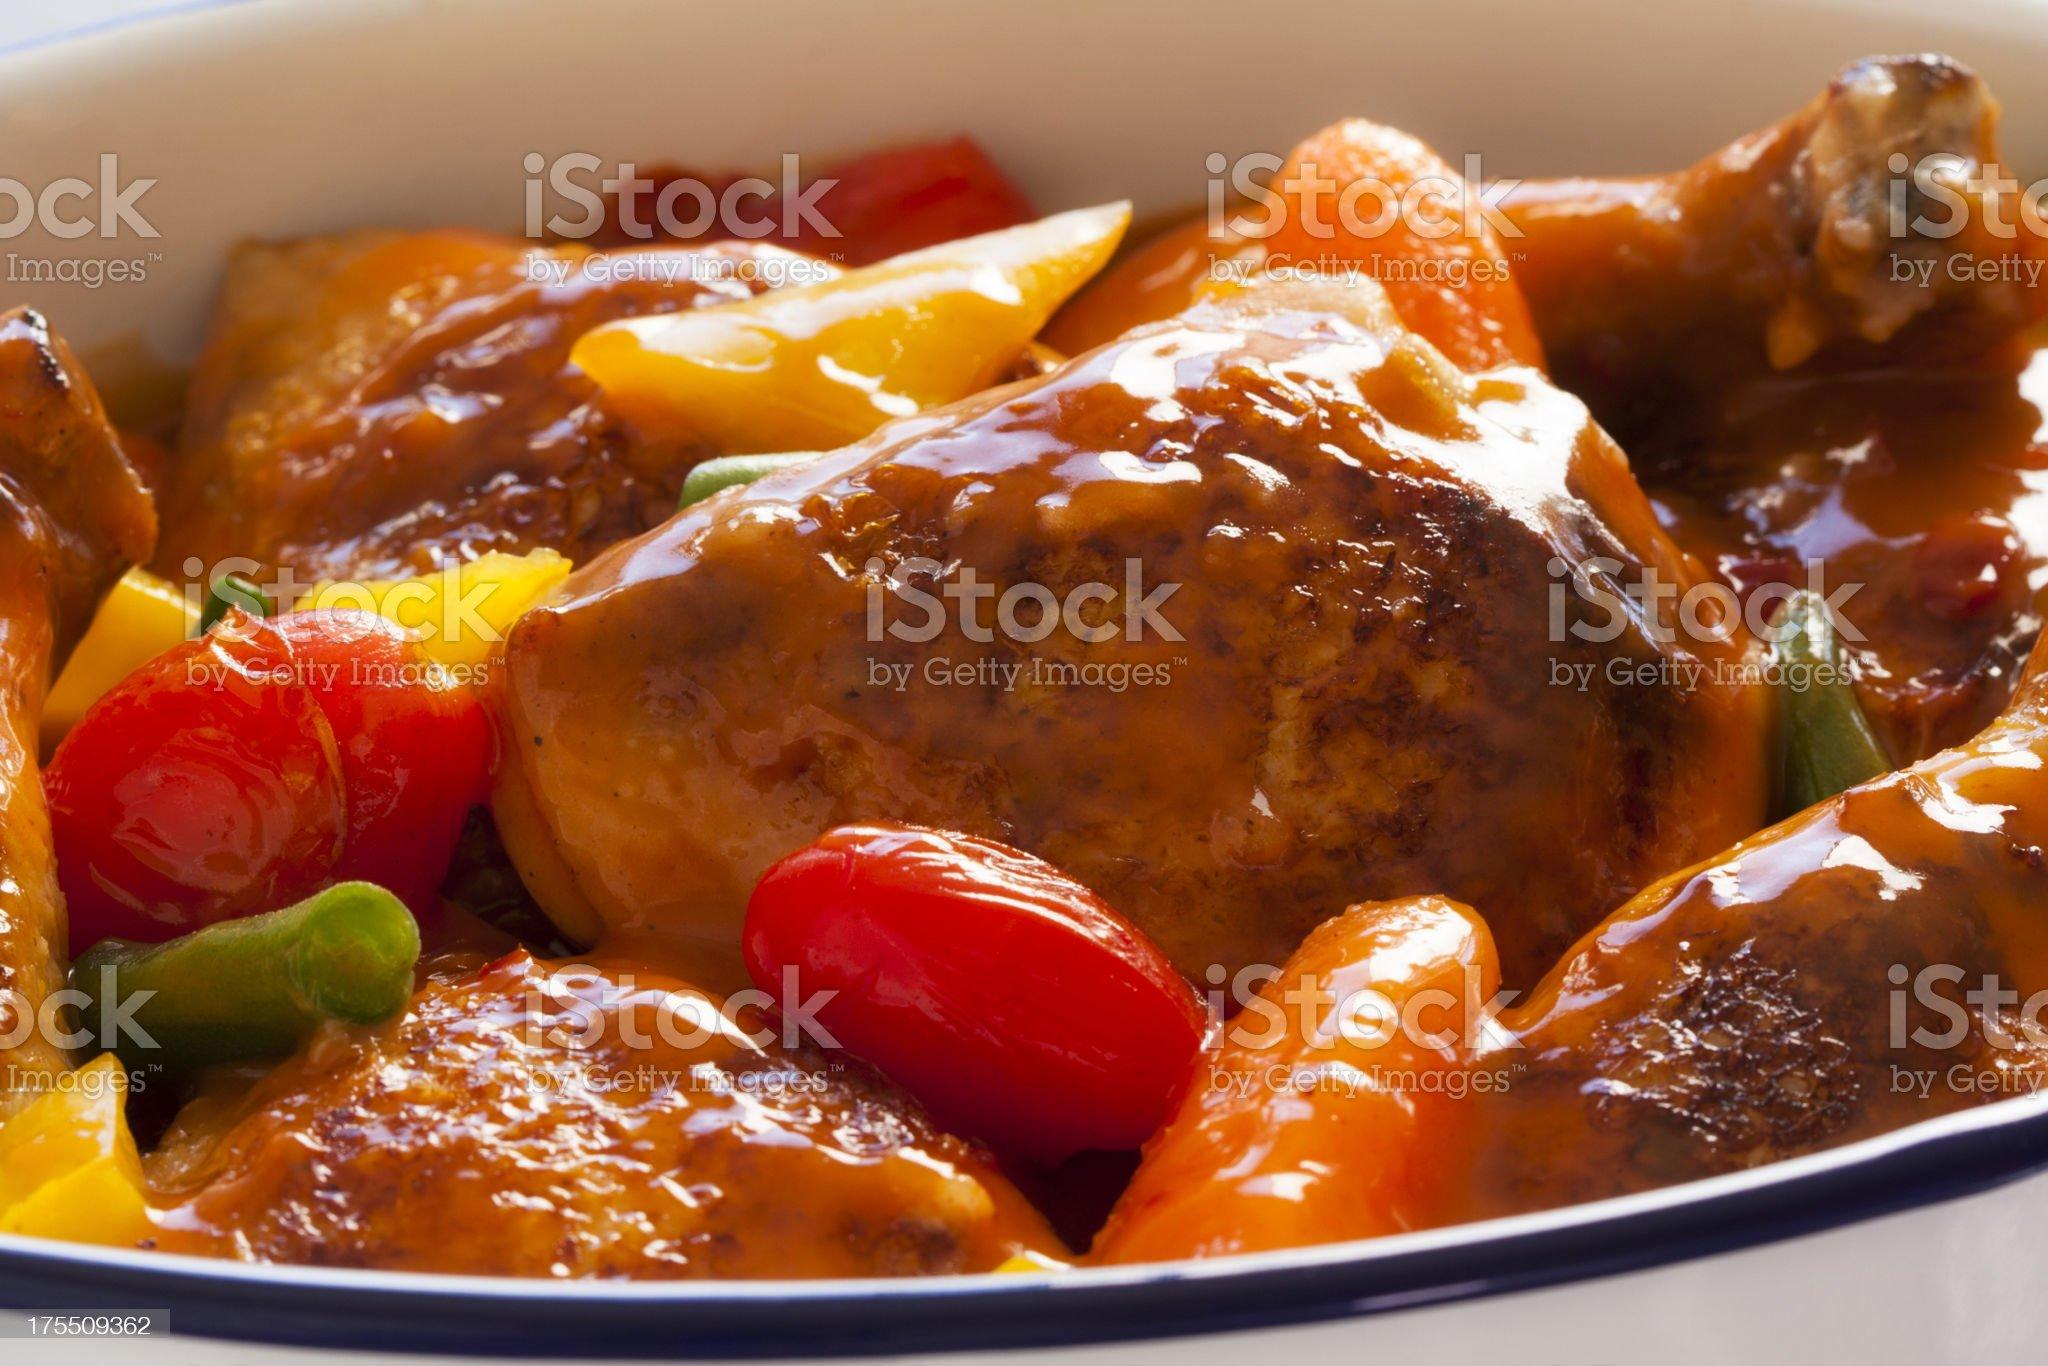 Chicken casserole royalty-free stock photo